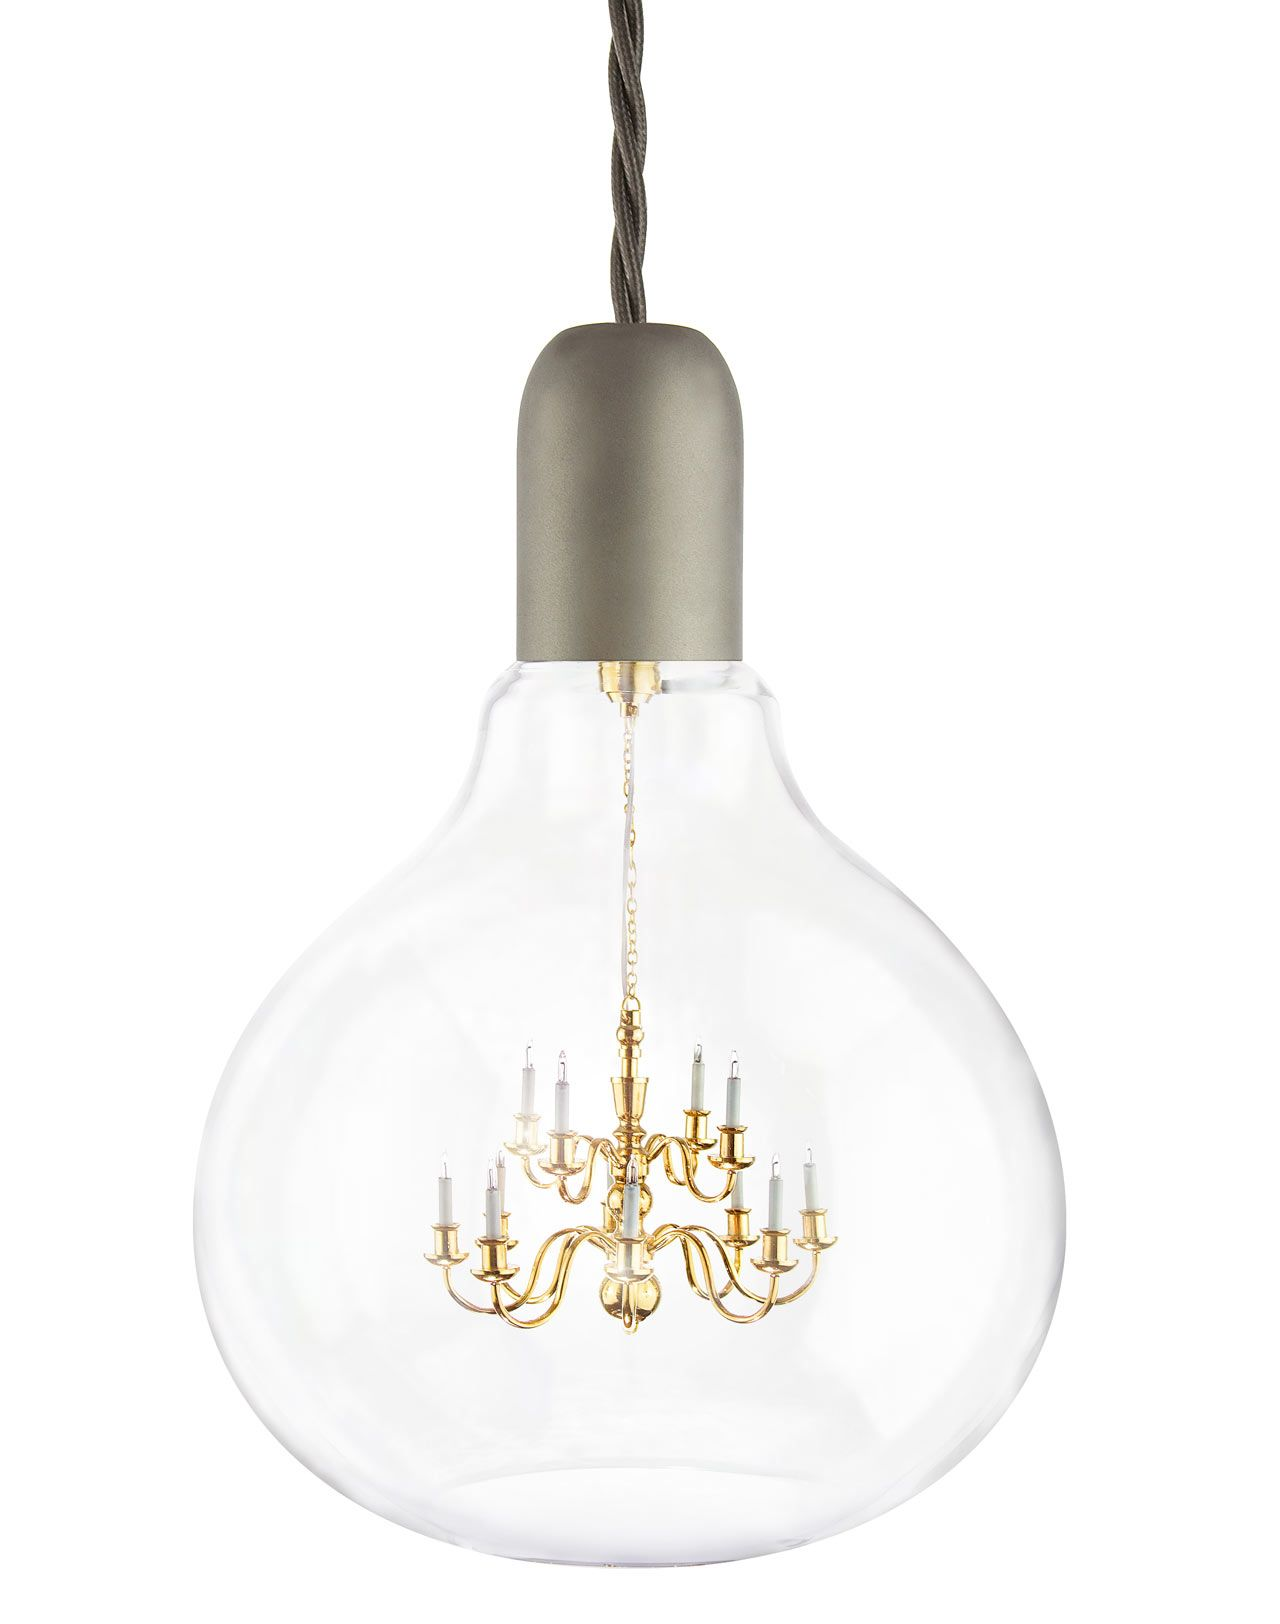 A light within a light king edison pendant lamp pendant lamps a light within a light king edison pendant lamp arubaitofo Images